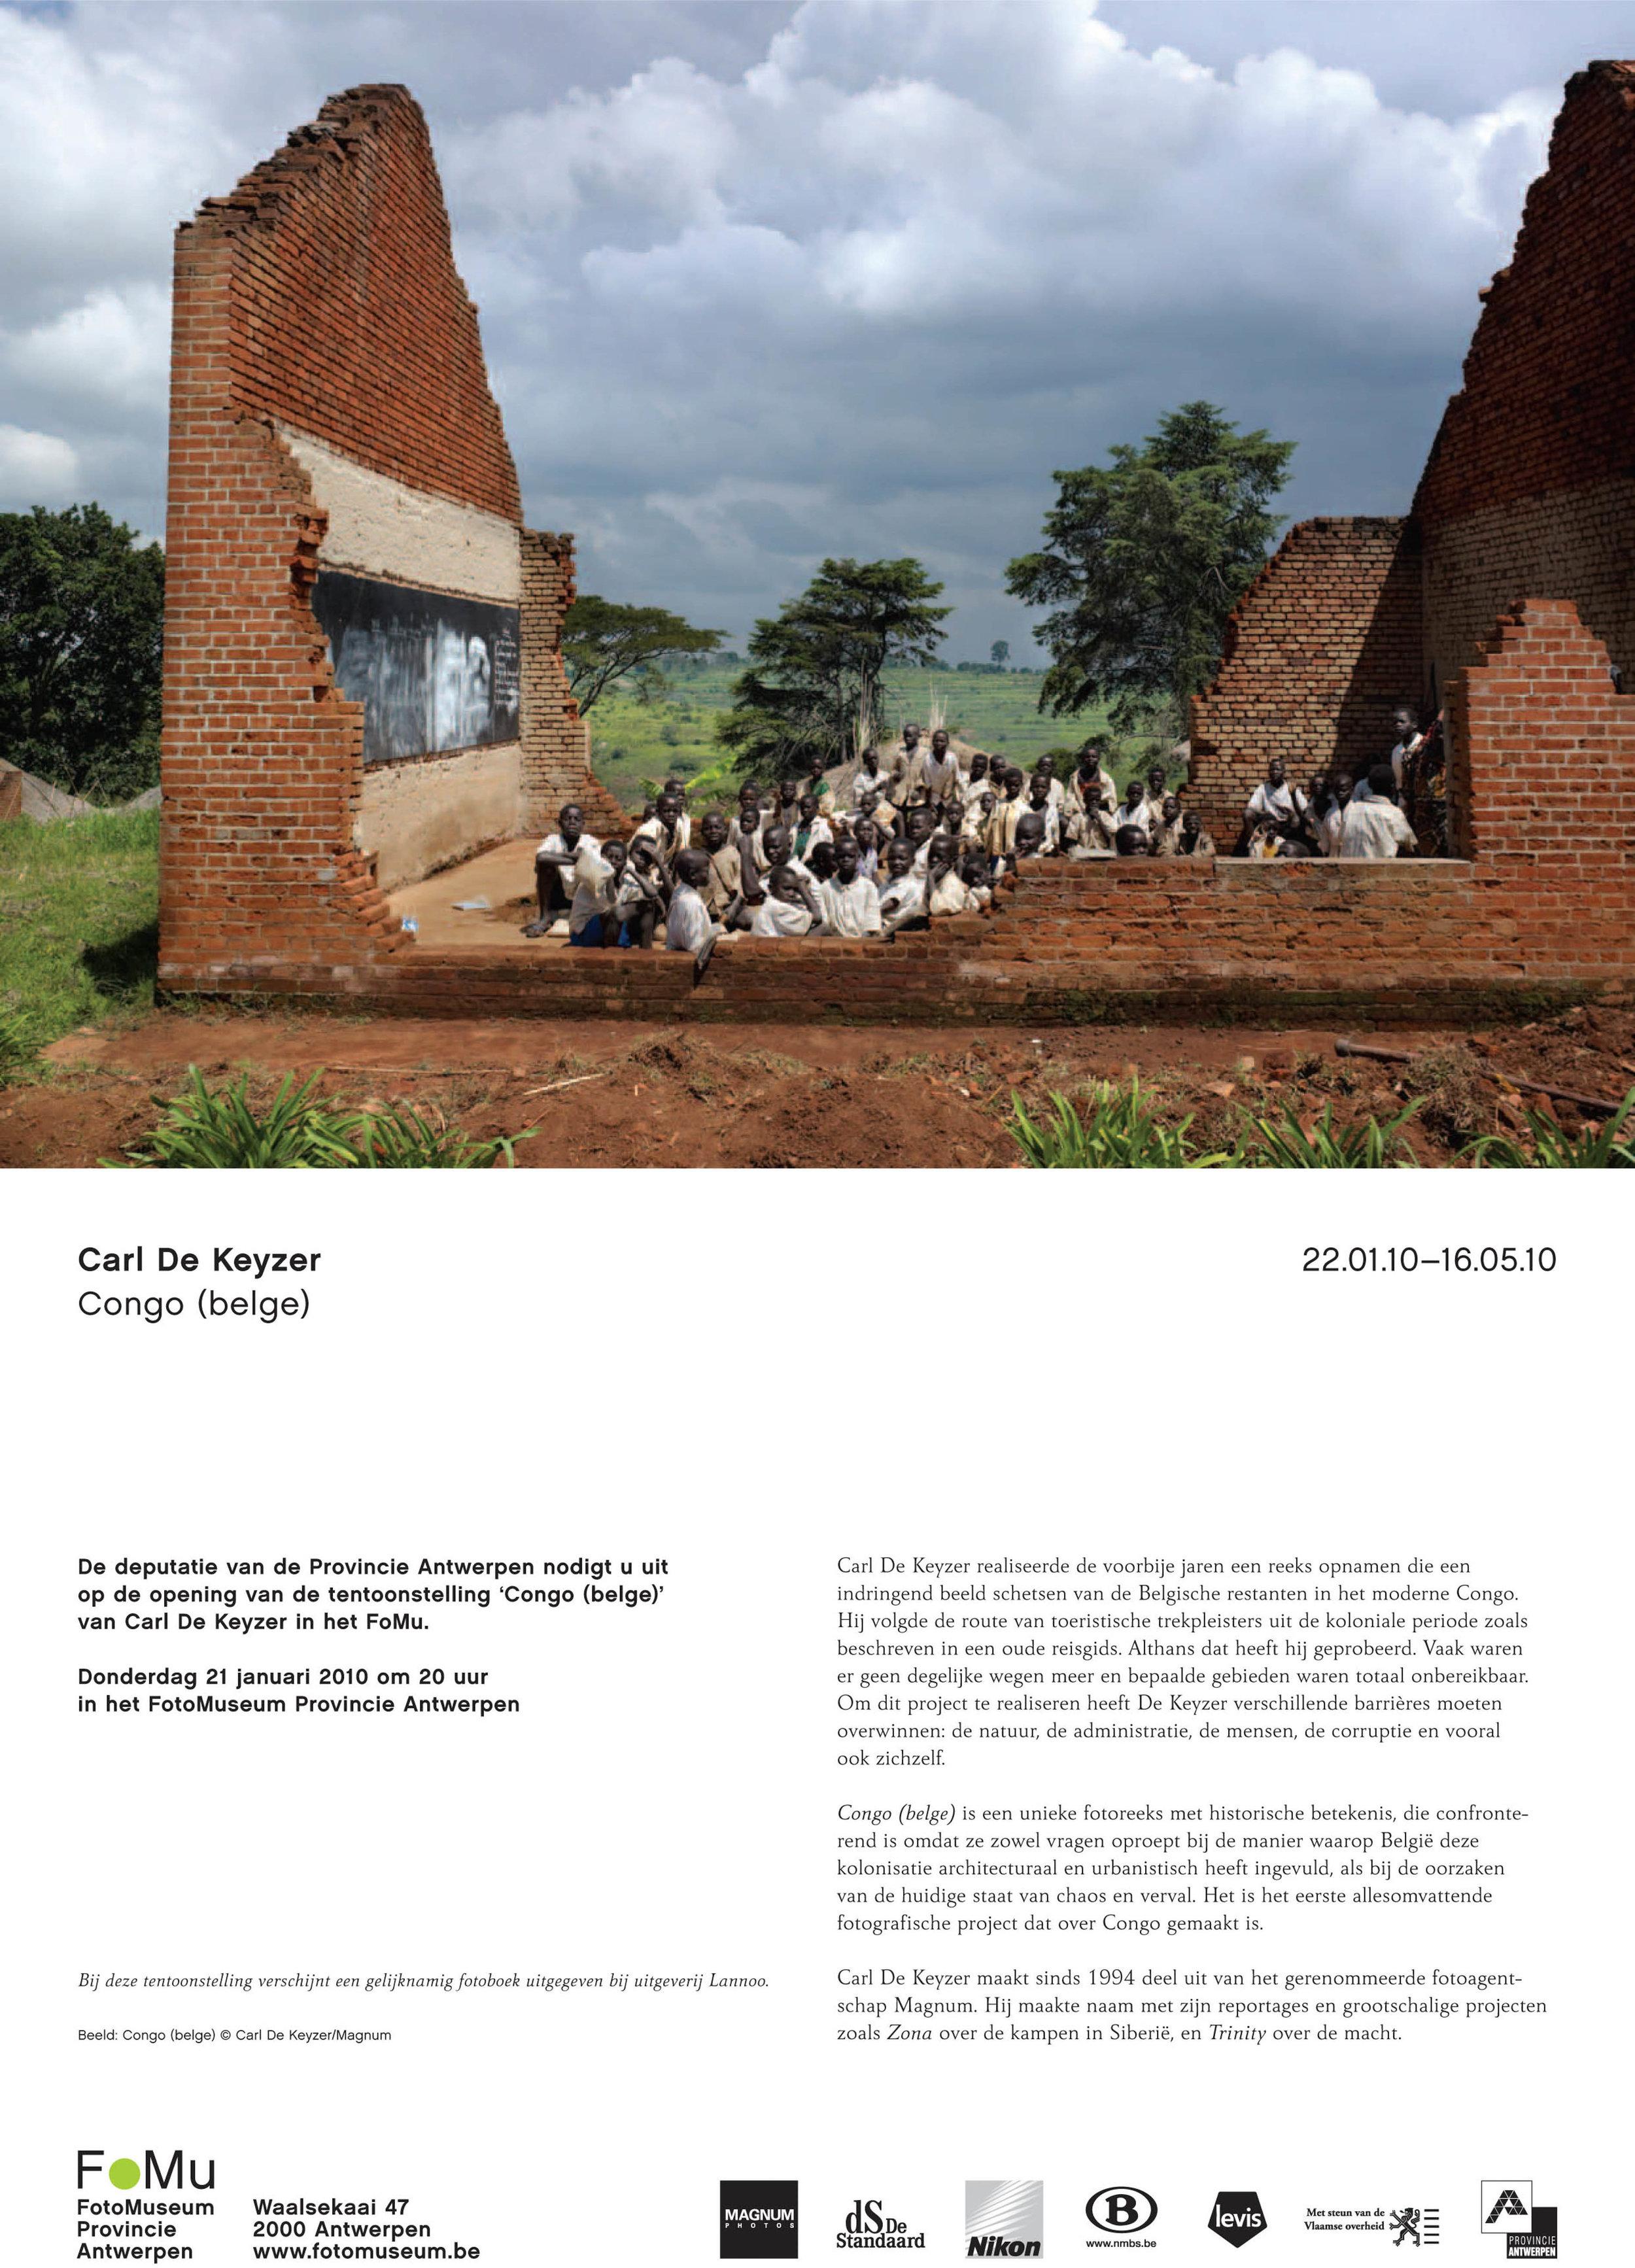 FoMu uitnodiging Congo (belge)_Carl De Keyzer.jpg